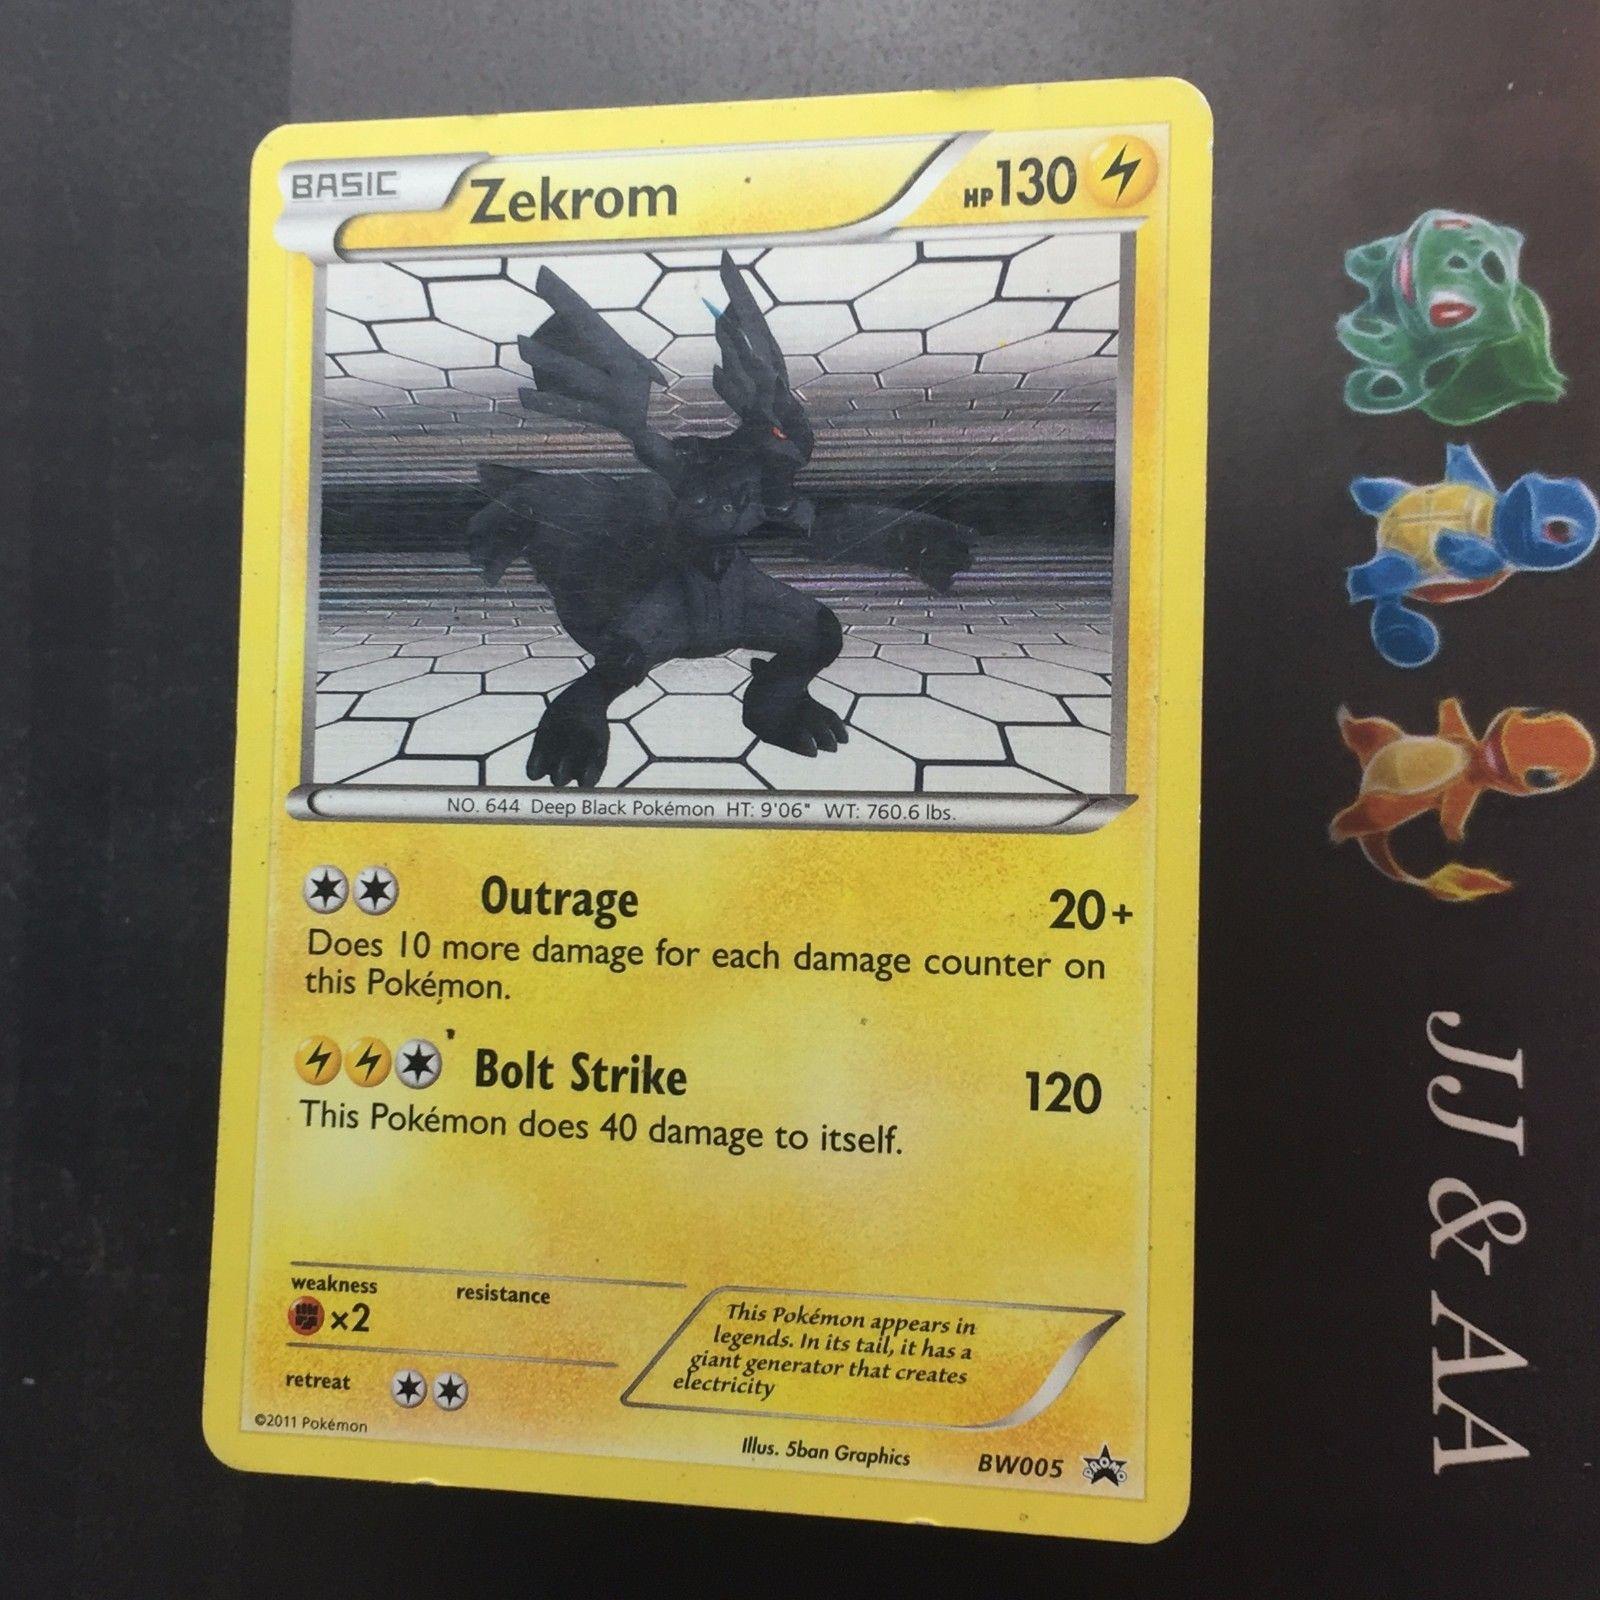 ZEKROM Holo Rare Pokemon NM Card PROMO Black Star BW005